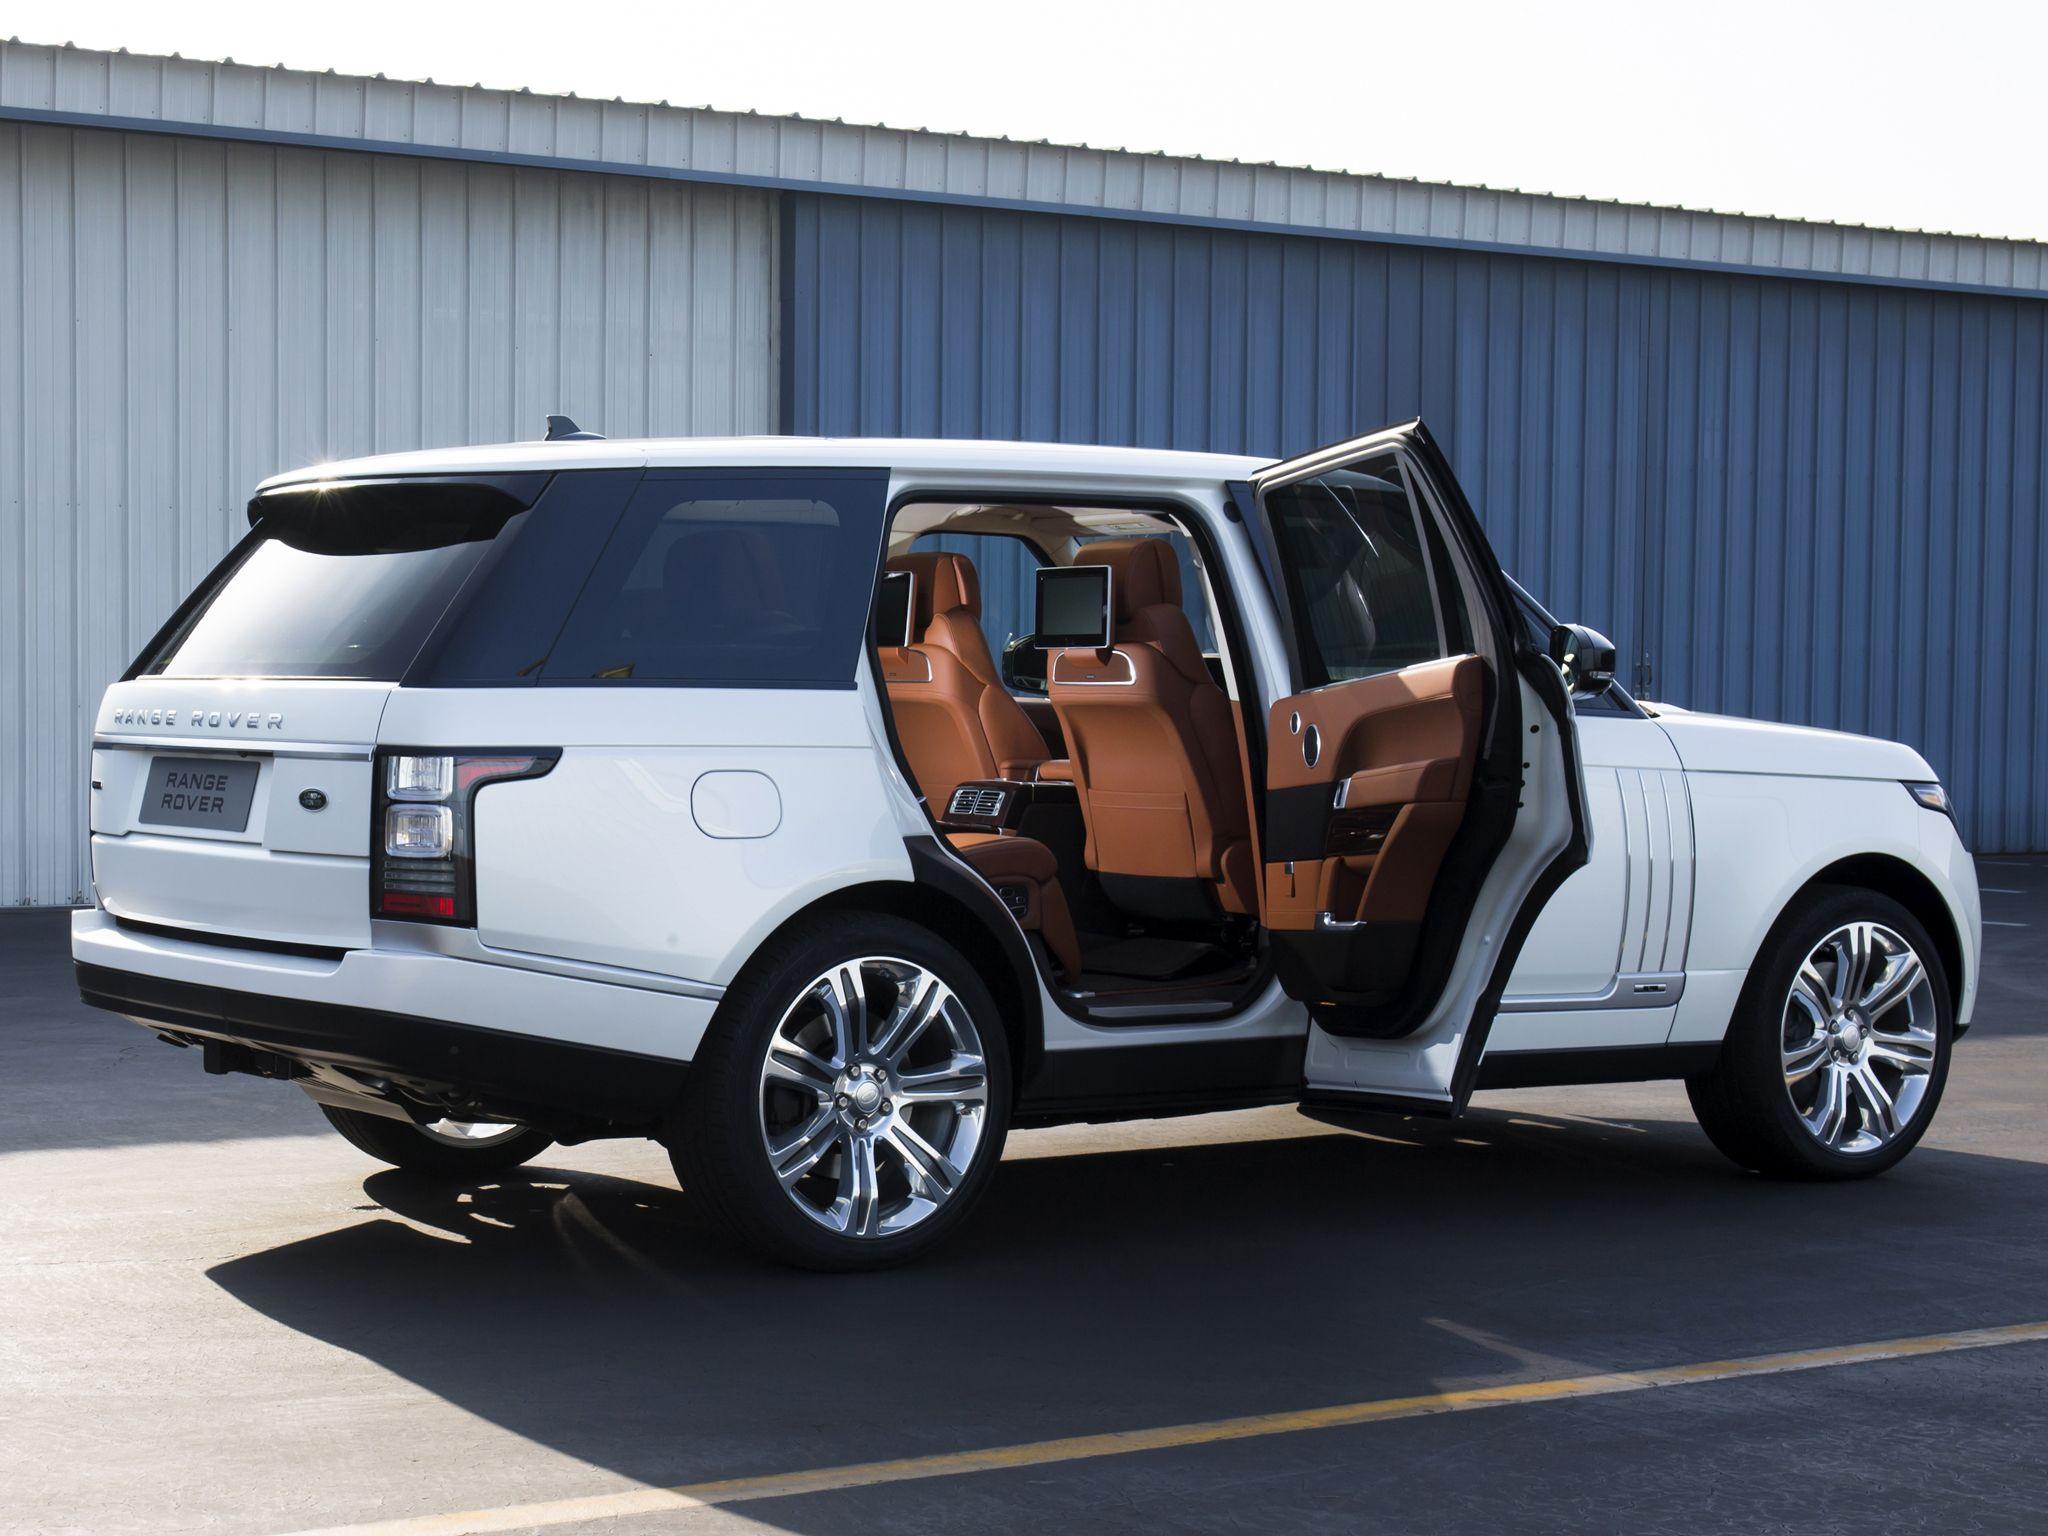 Hottest LA Debuts 2014 Range Rover LWB Autobiography Black